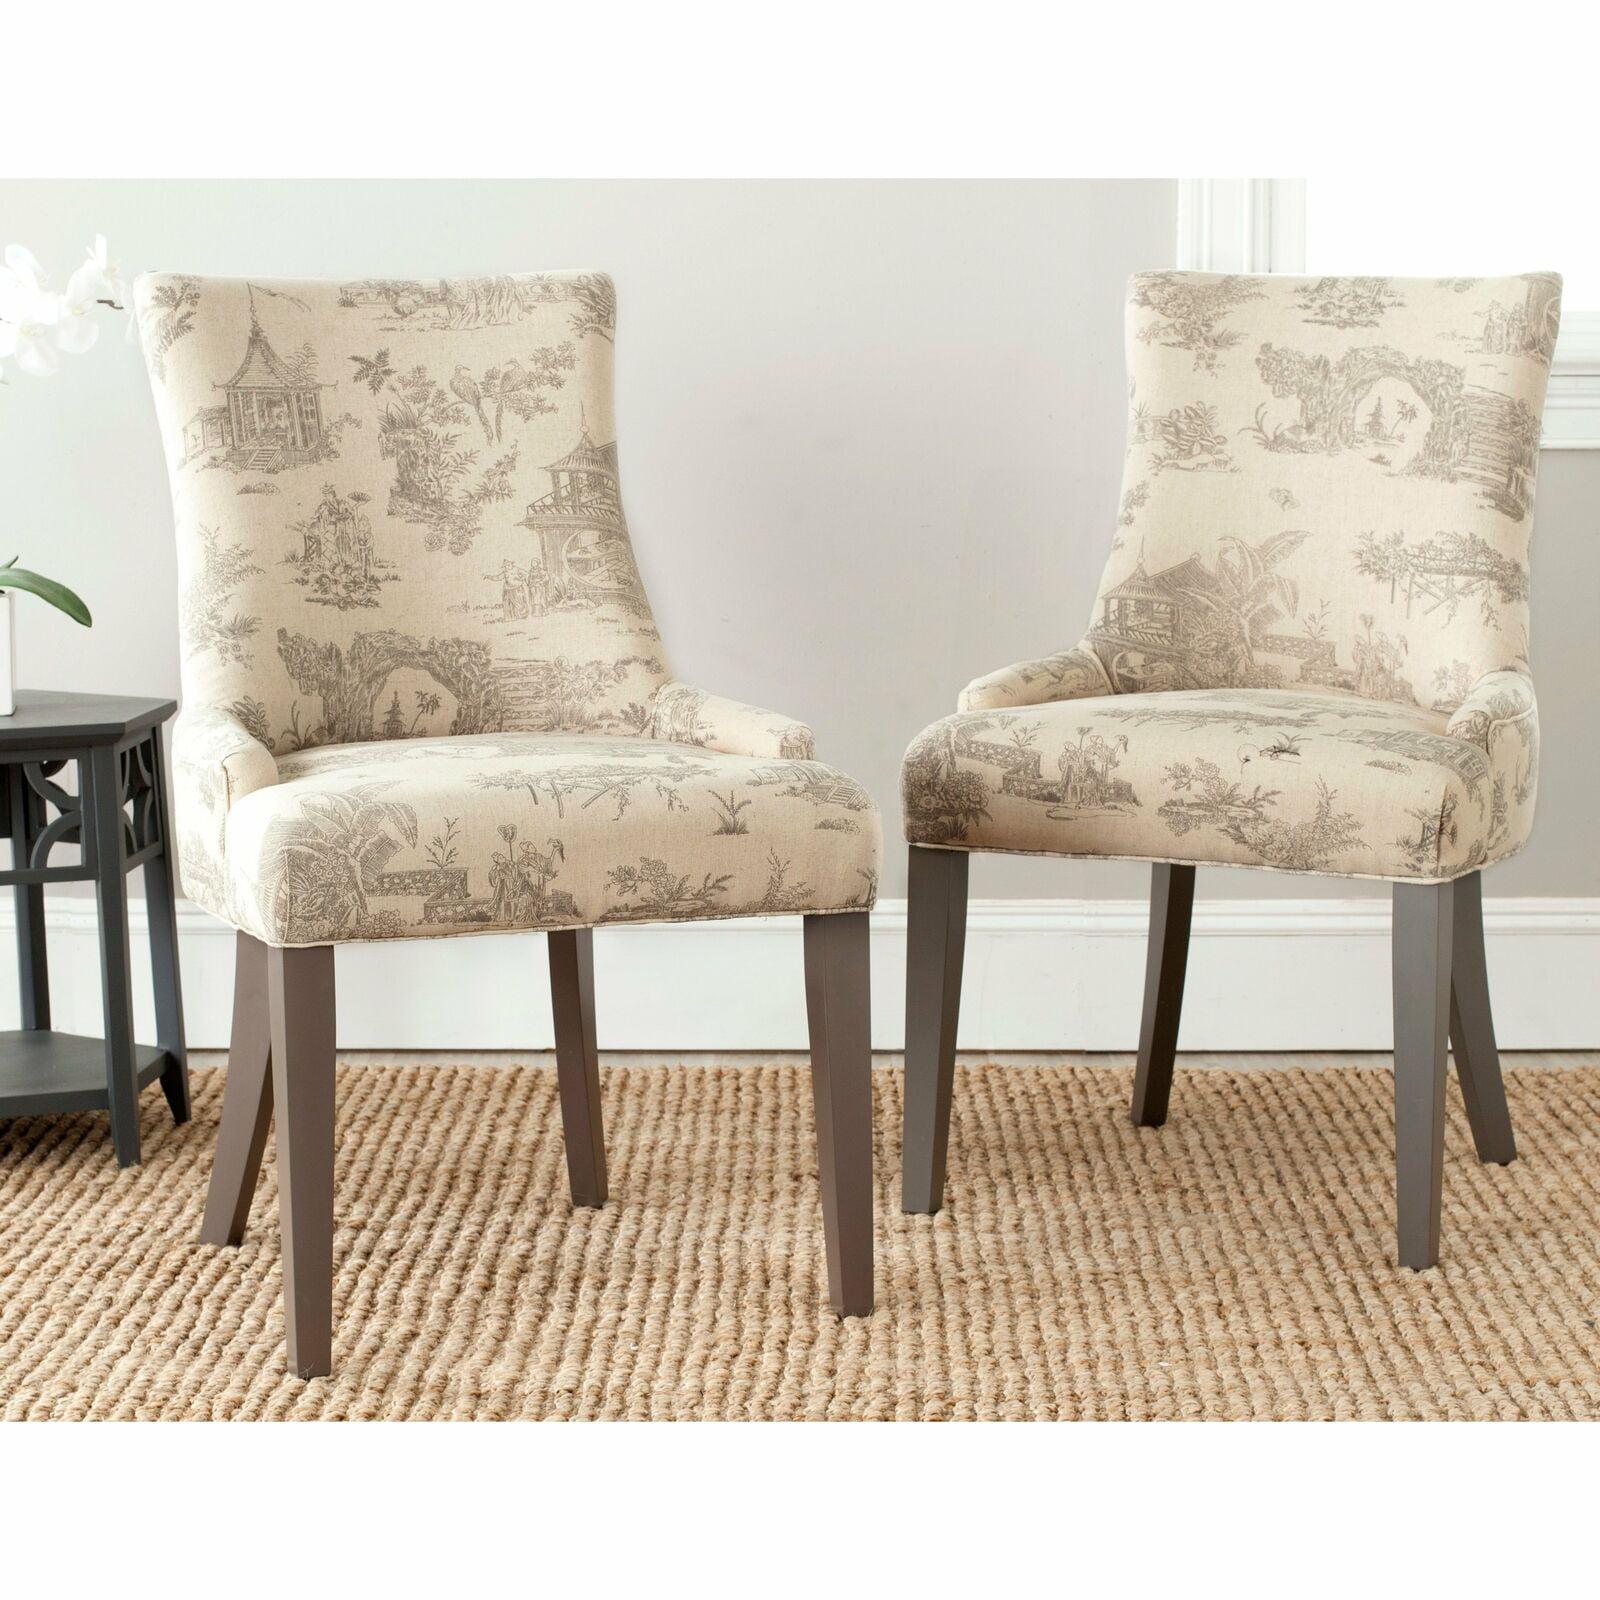 En Vogue Dining Lester Taupe Print Dining Chairs Set Of 2 0 Walmart Com Walmart Com